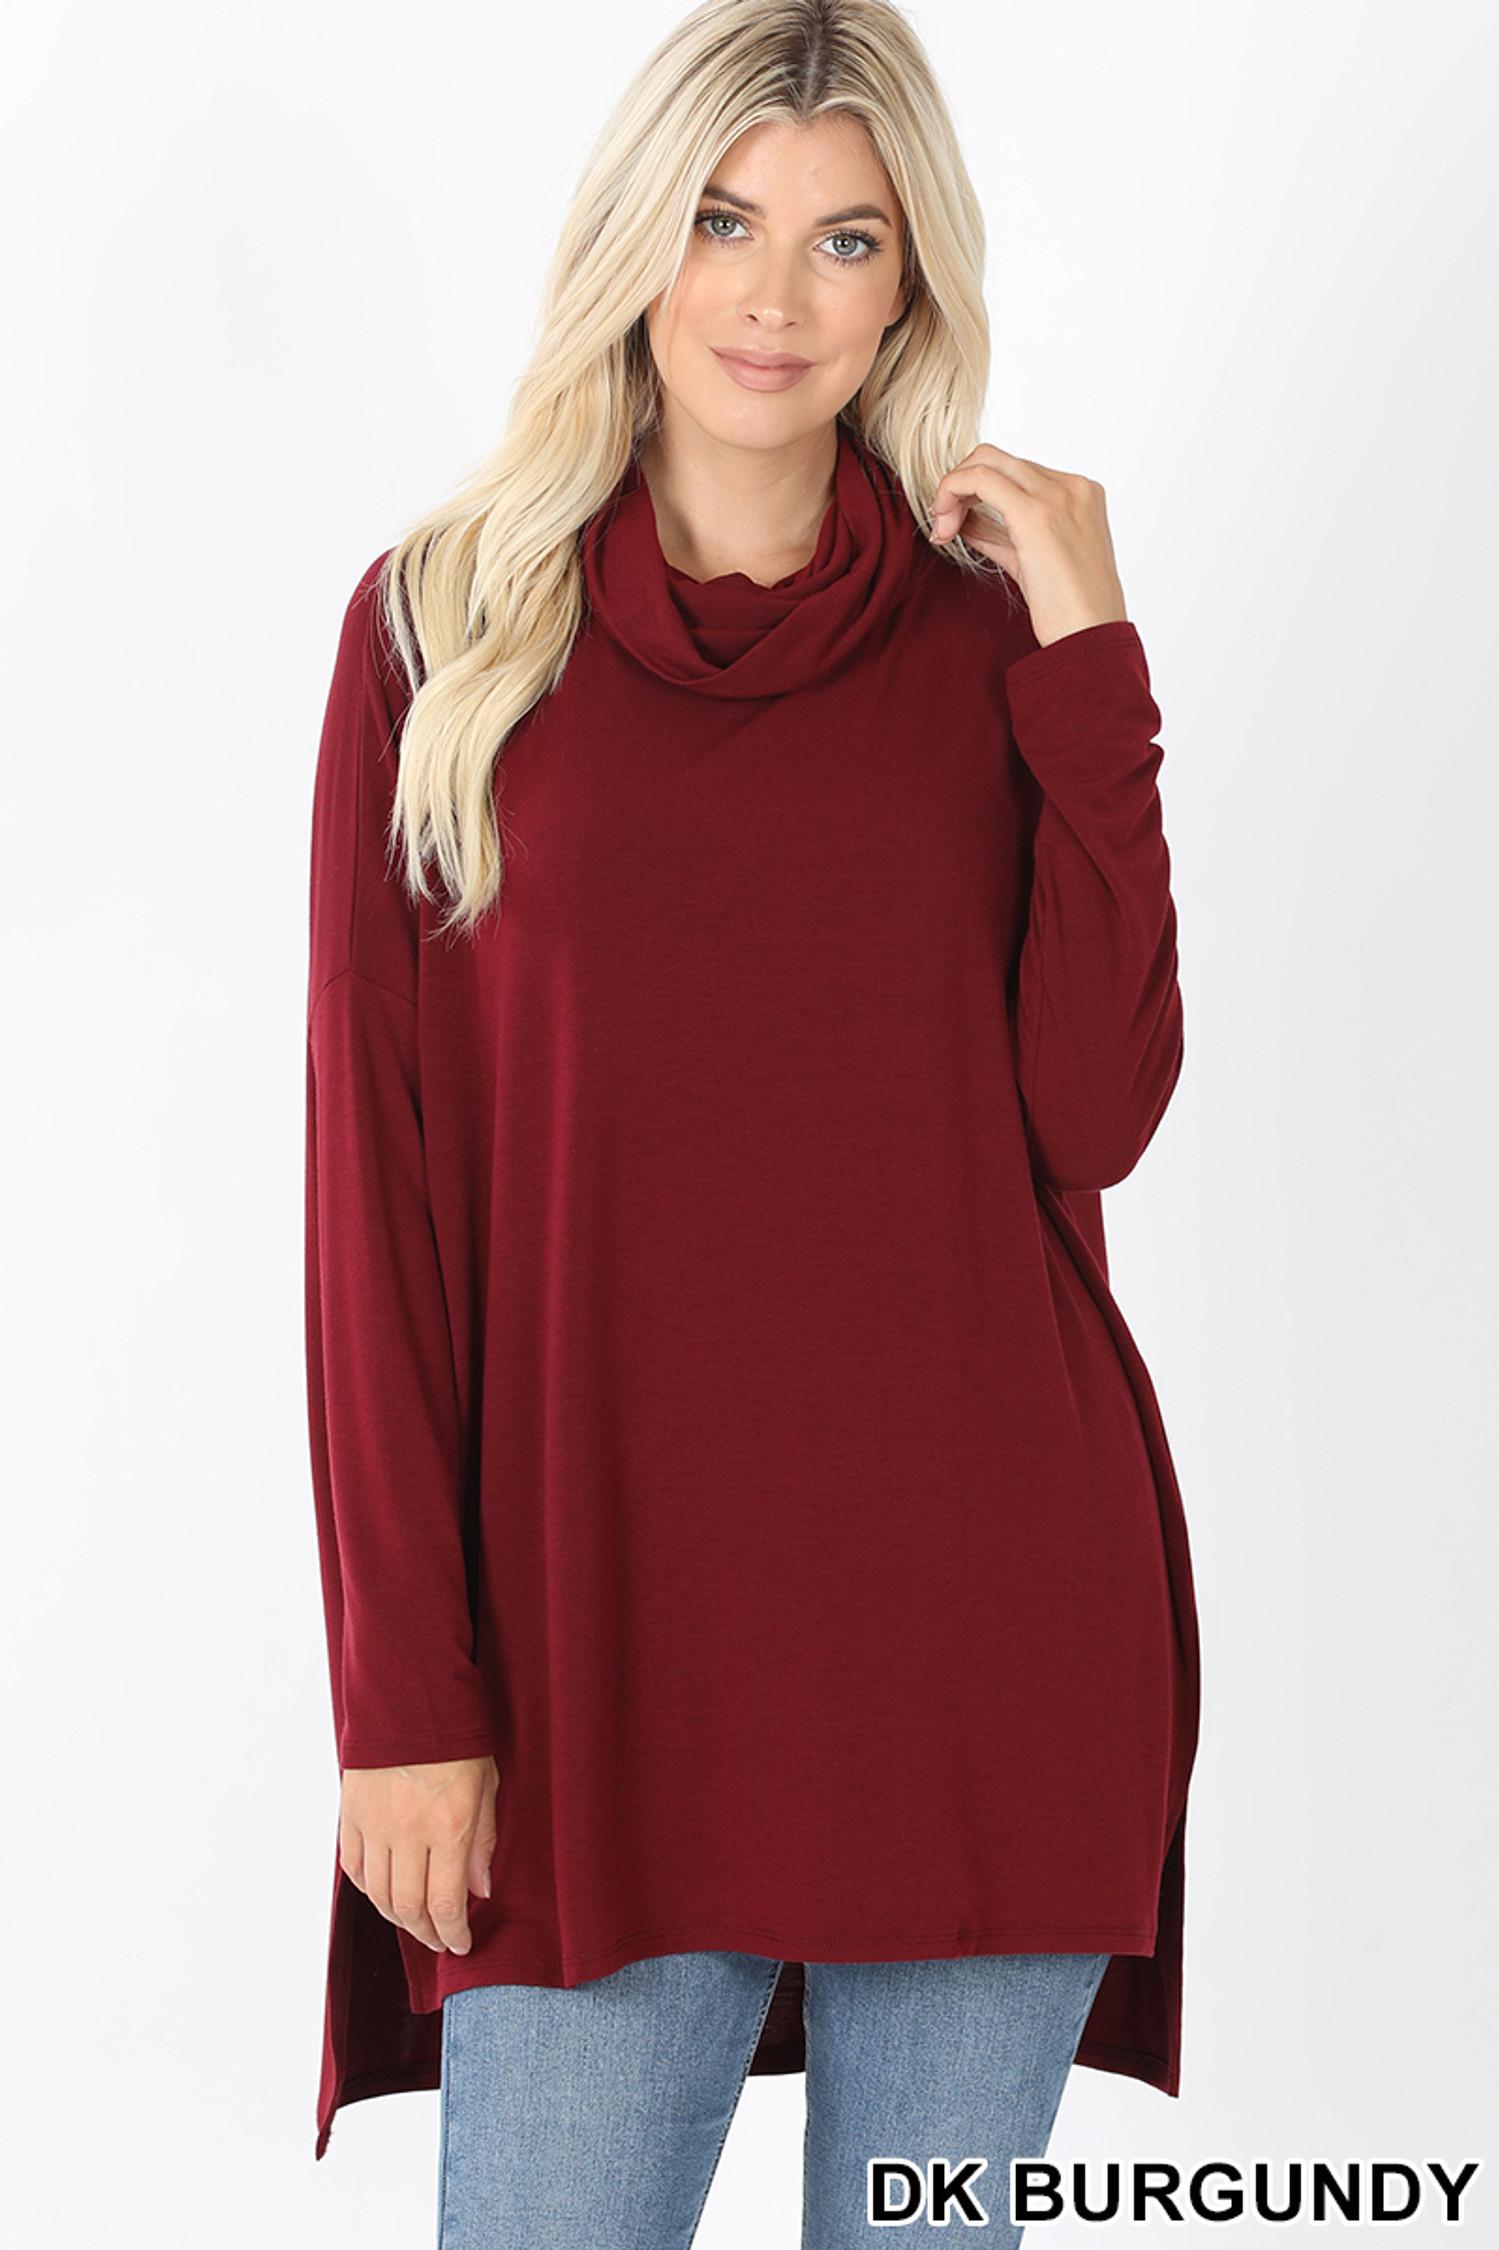 Front image of Dark Burgundy Cowl Neck Hi-Low Long Sleeve Top